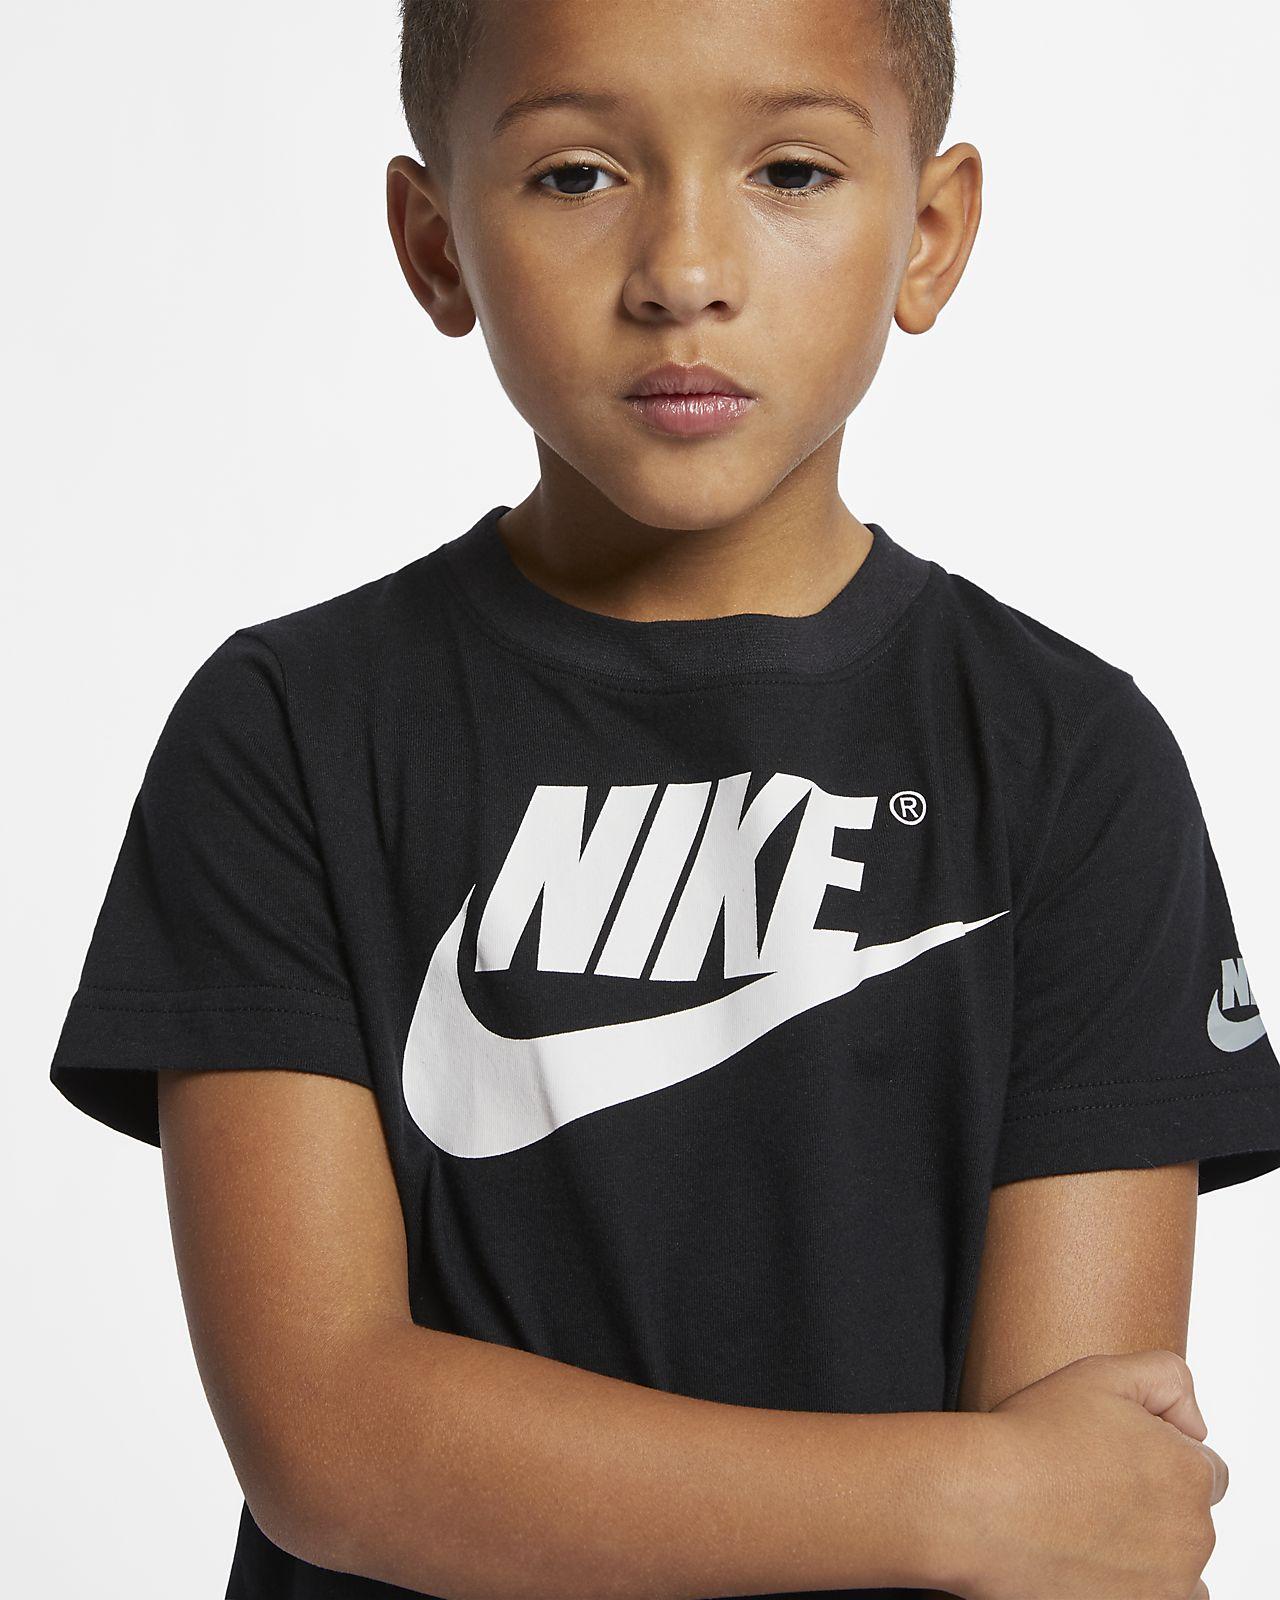 e03b4e05 Nike Sportswear Little Kids' T-Shirt